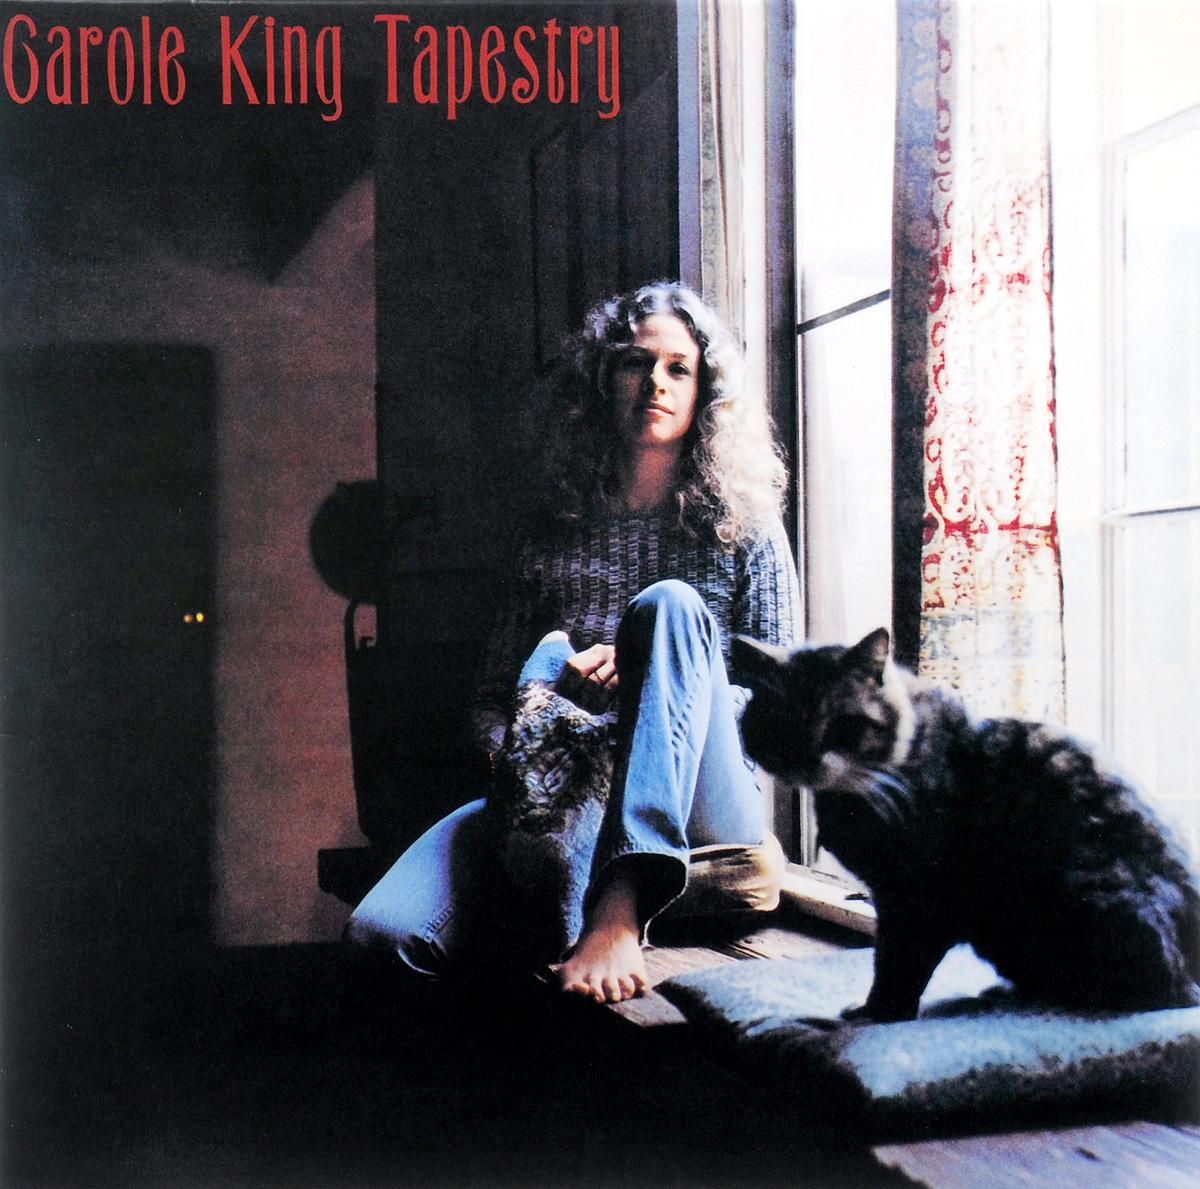 Кэрол Кинг Carole King. Tapestry (LP) carole king carole king her greatest hits